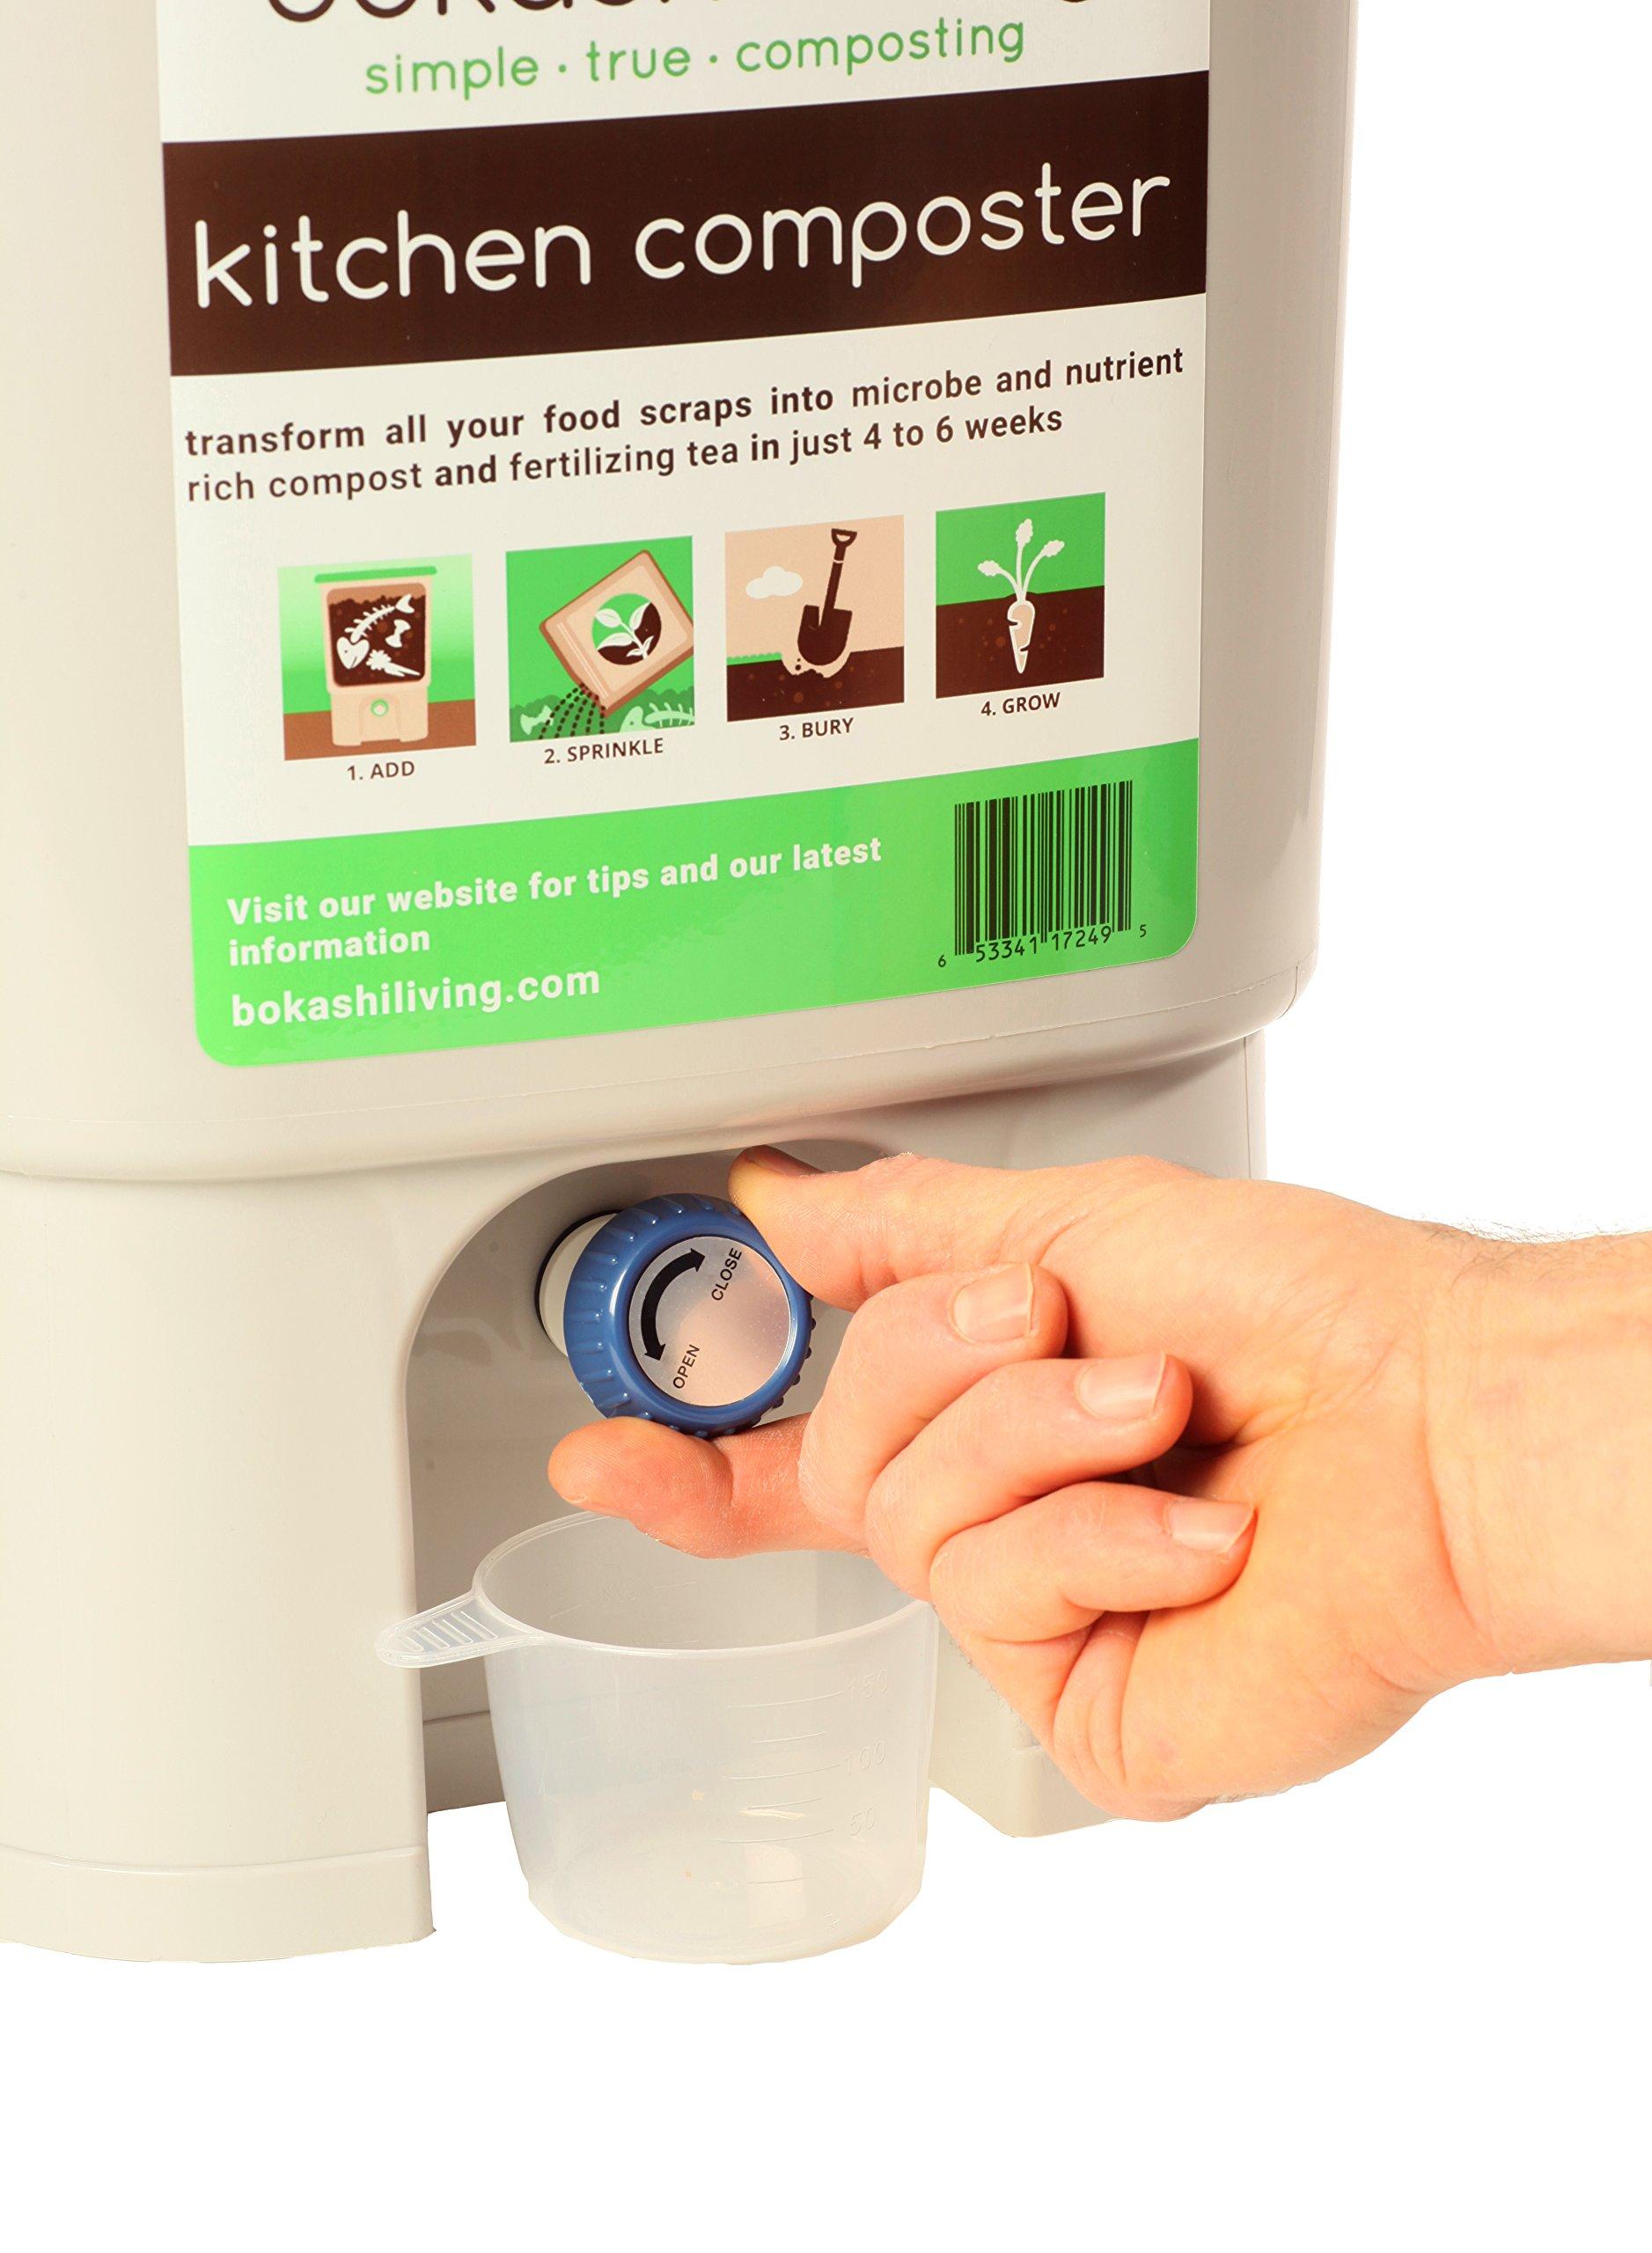 Bokashi Composting Starter Kit Includes 2 Bokashi Bins, 3.5lbs of Bokashi Bran and Full Instructions